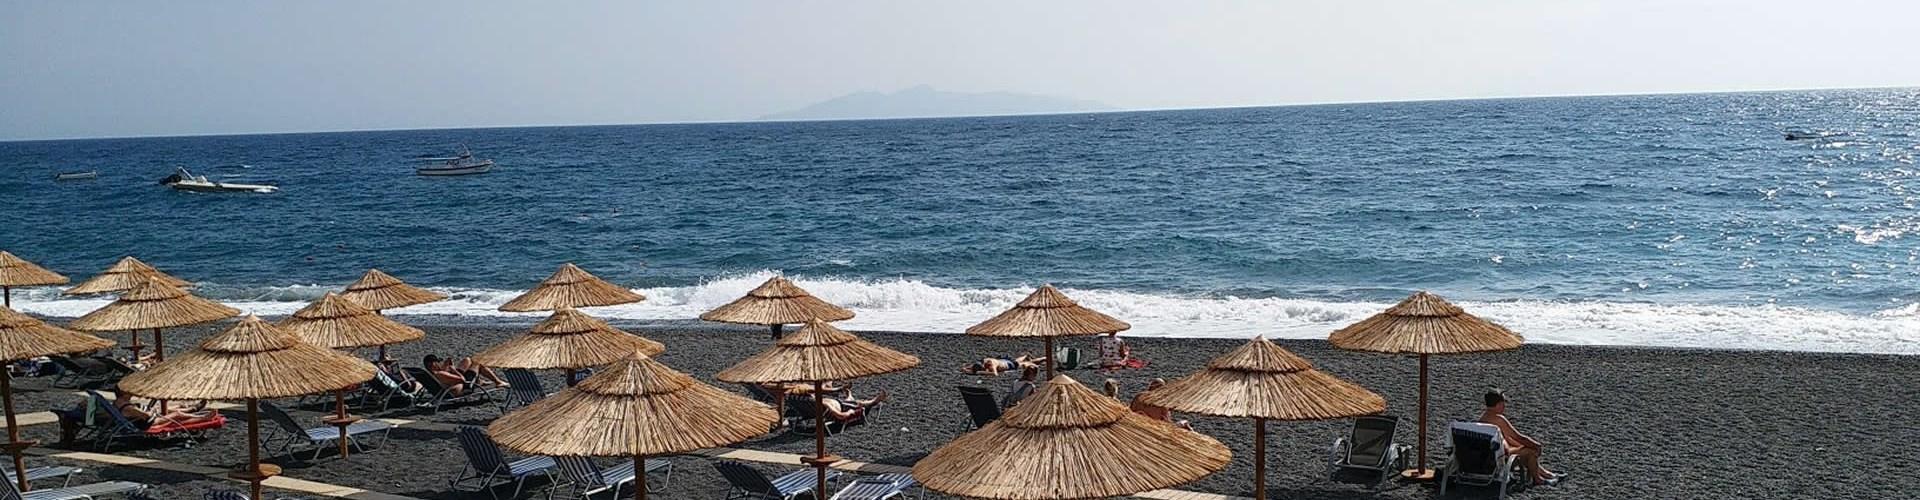 The Black Sand Beach in Santorini